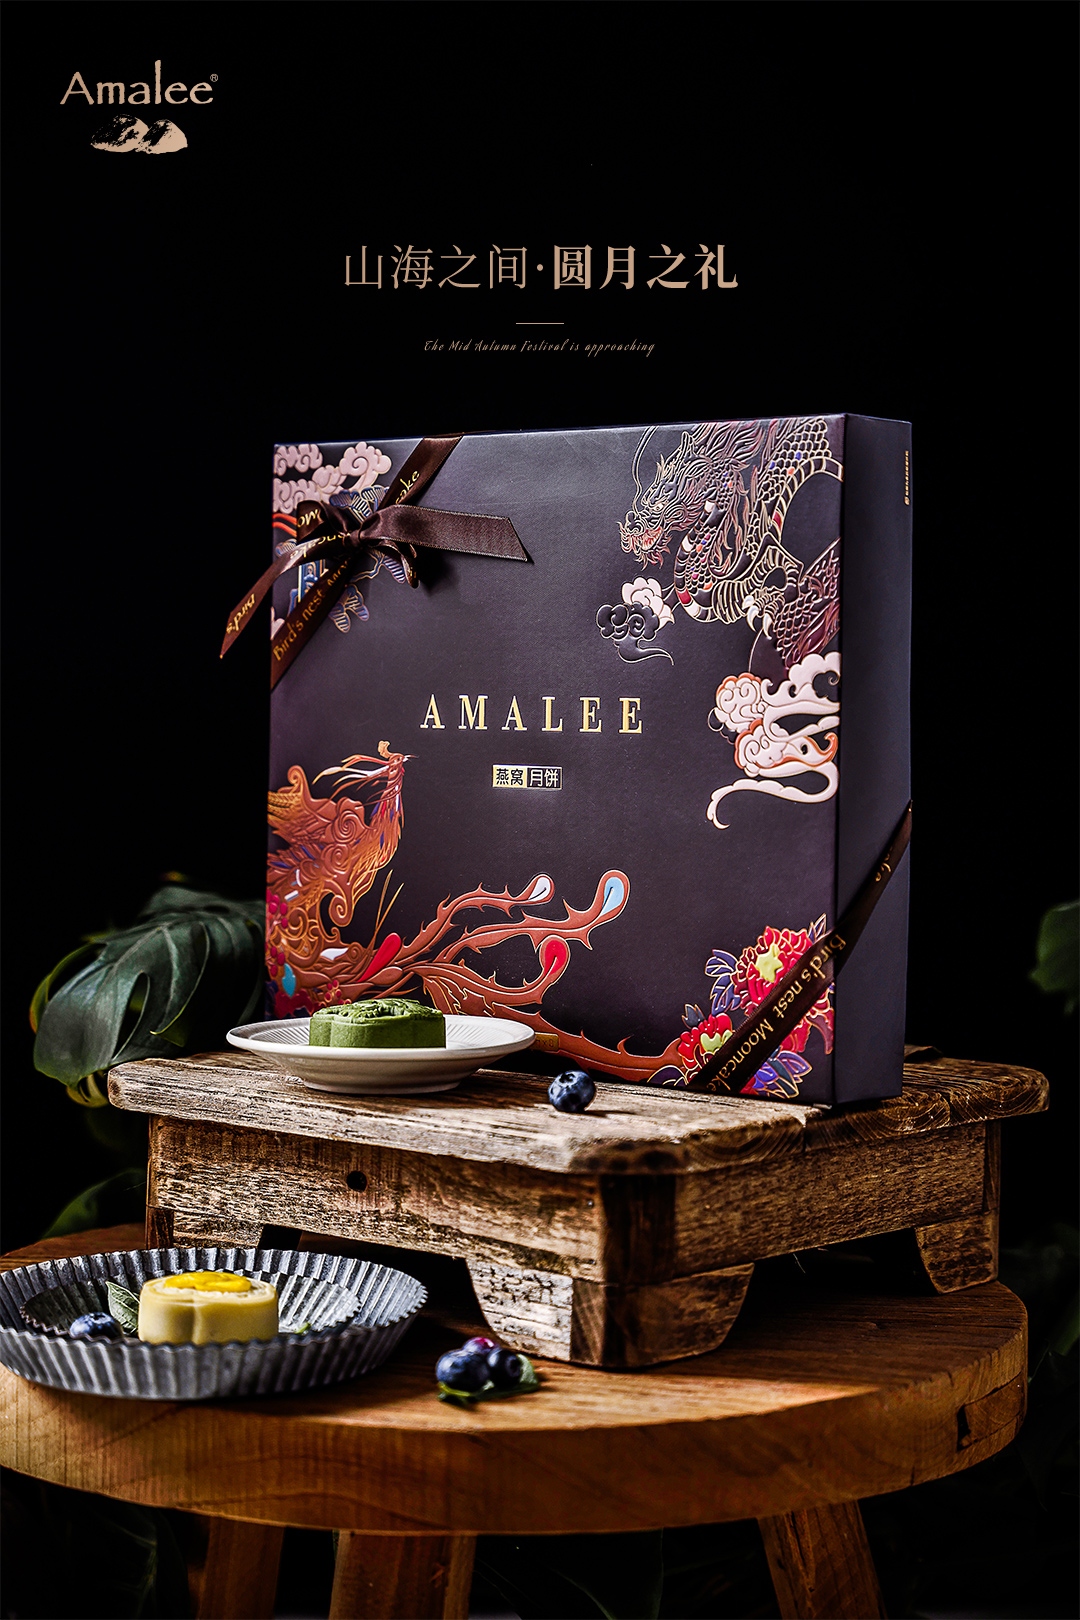 Amalee Birdnest mooncake